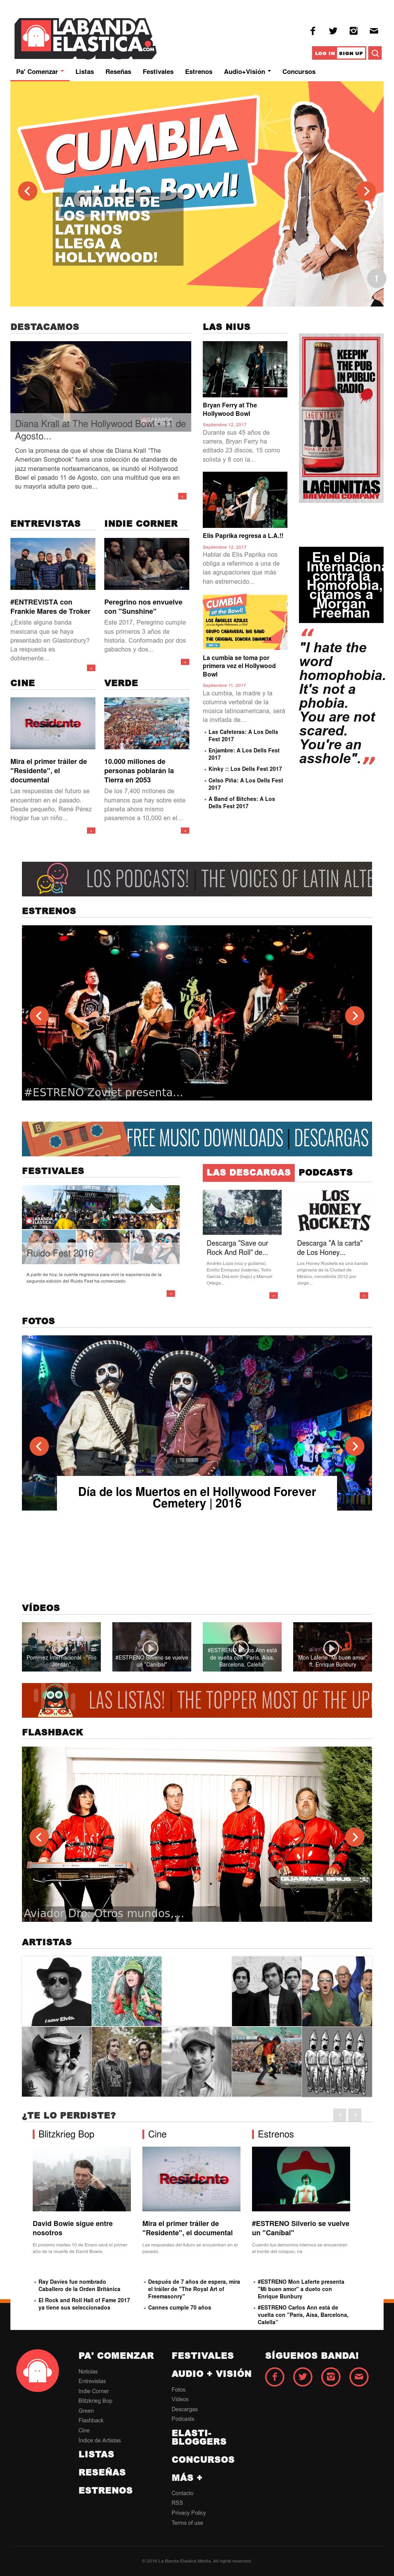 Amor A La Mexicana Movie la banda elastica competitors, revenue and employees - owler